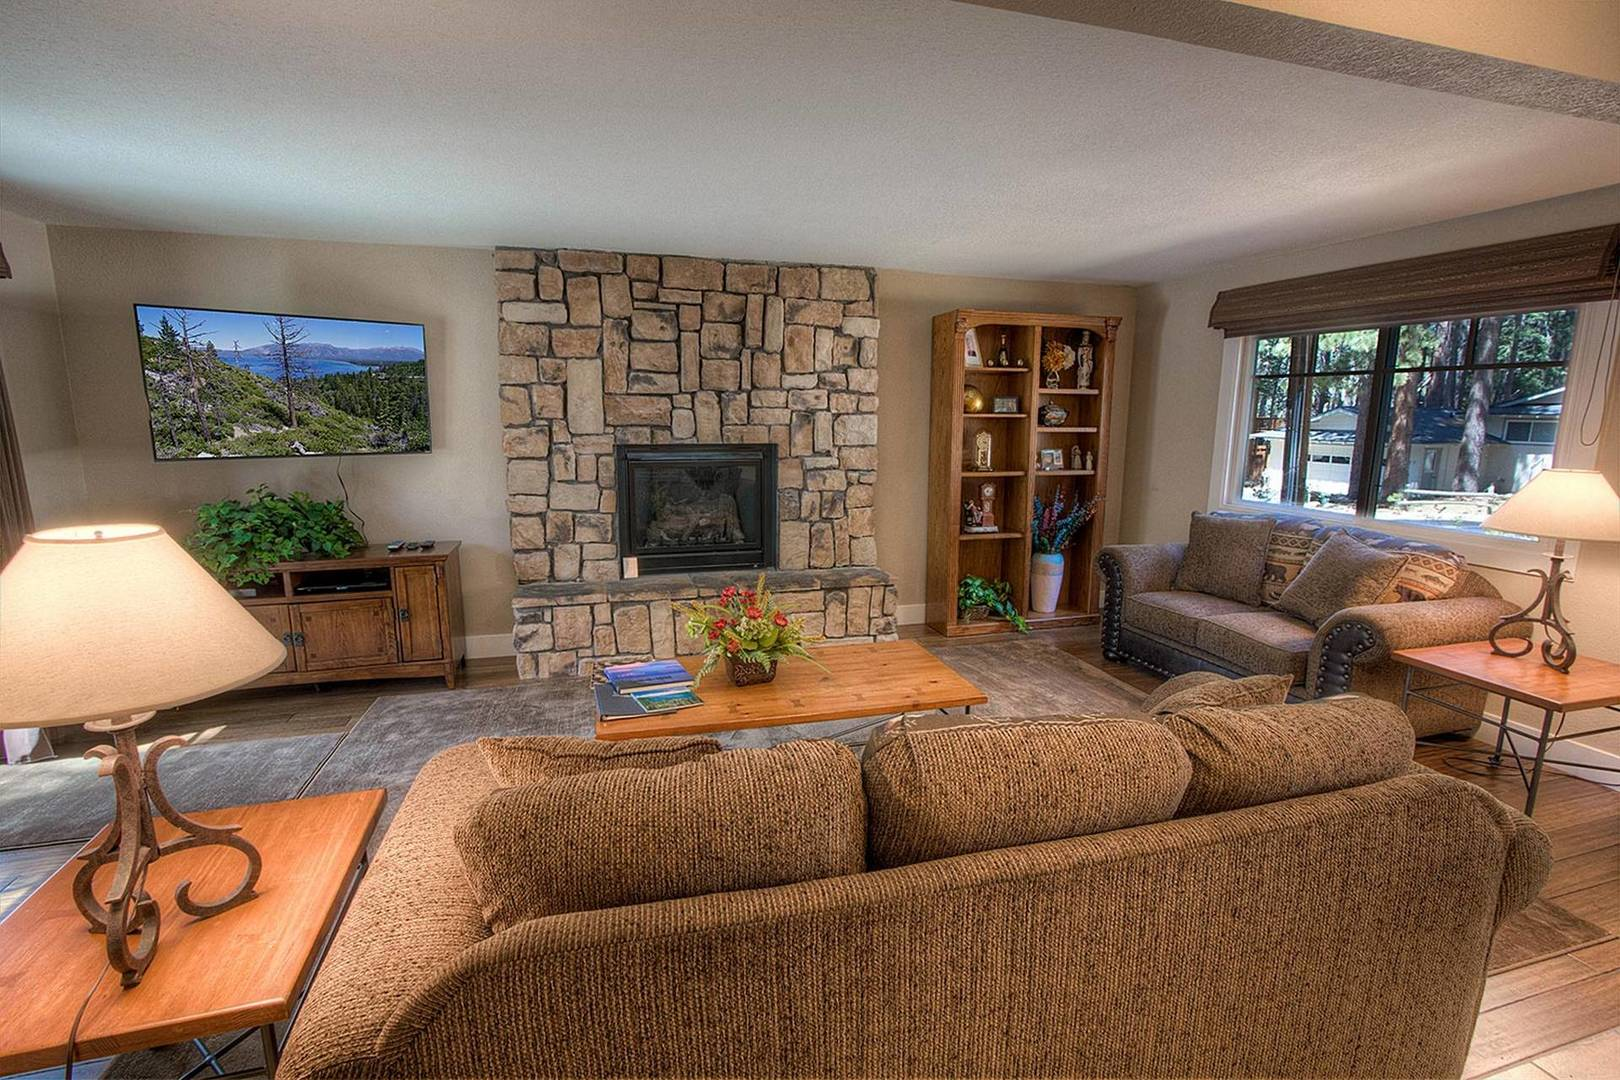 hch0682 living room